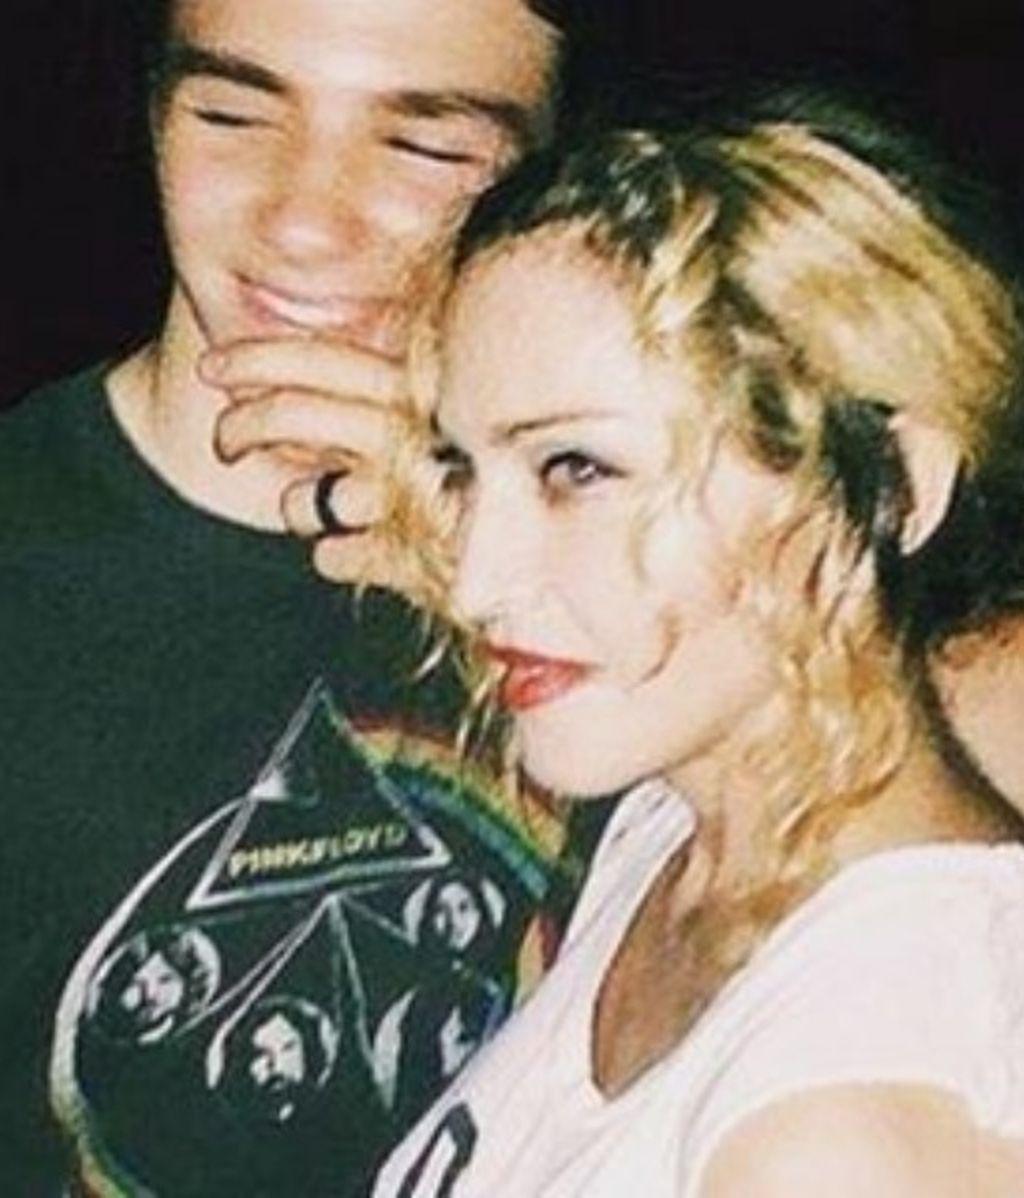 Rocco Ritchie bloquea a su madre 'Madonna' de Instagram